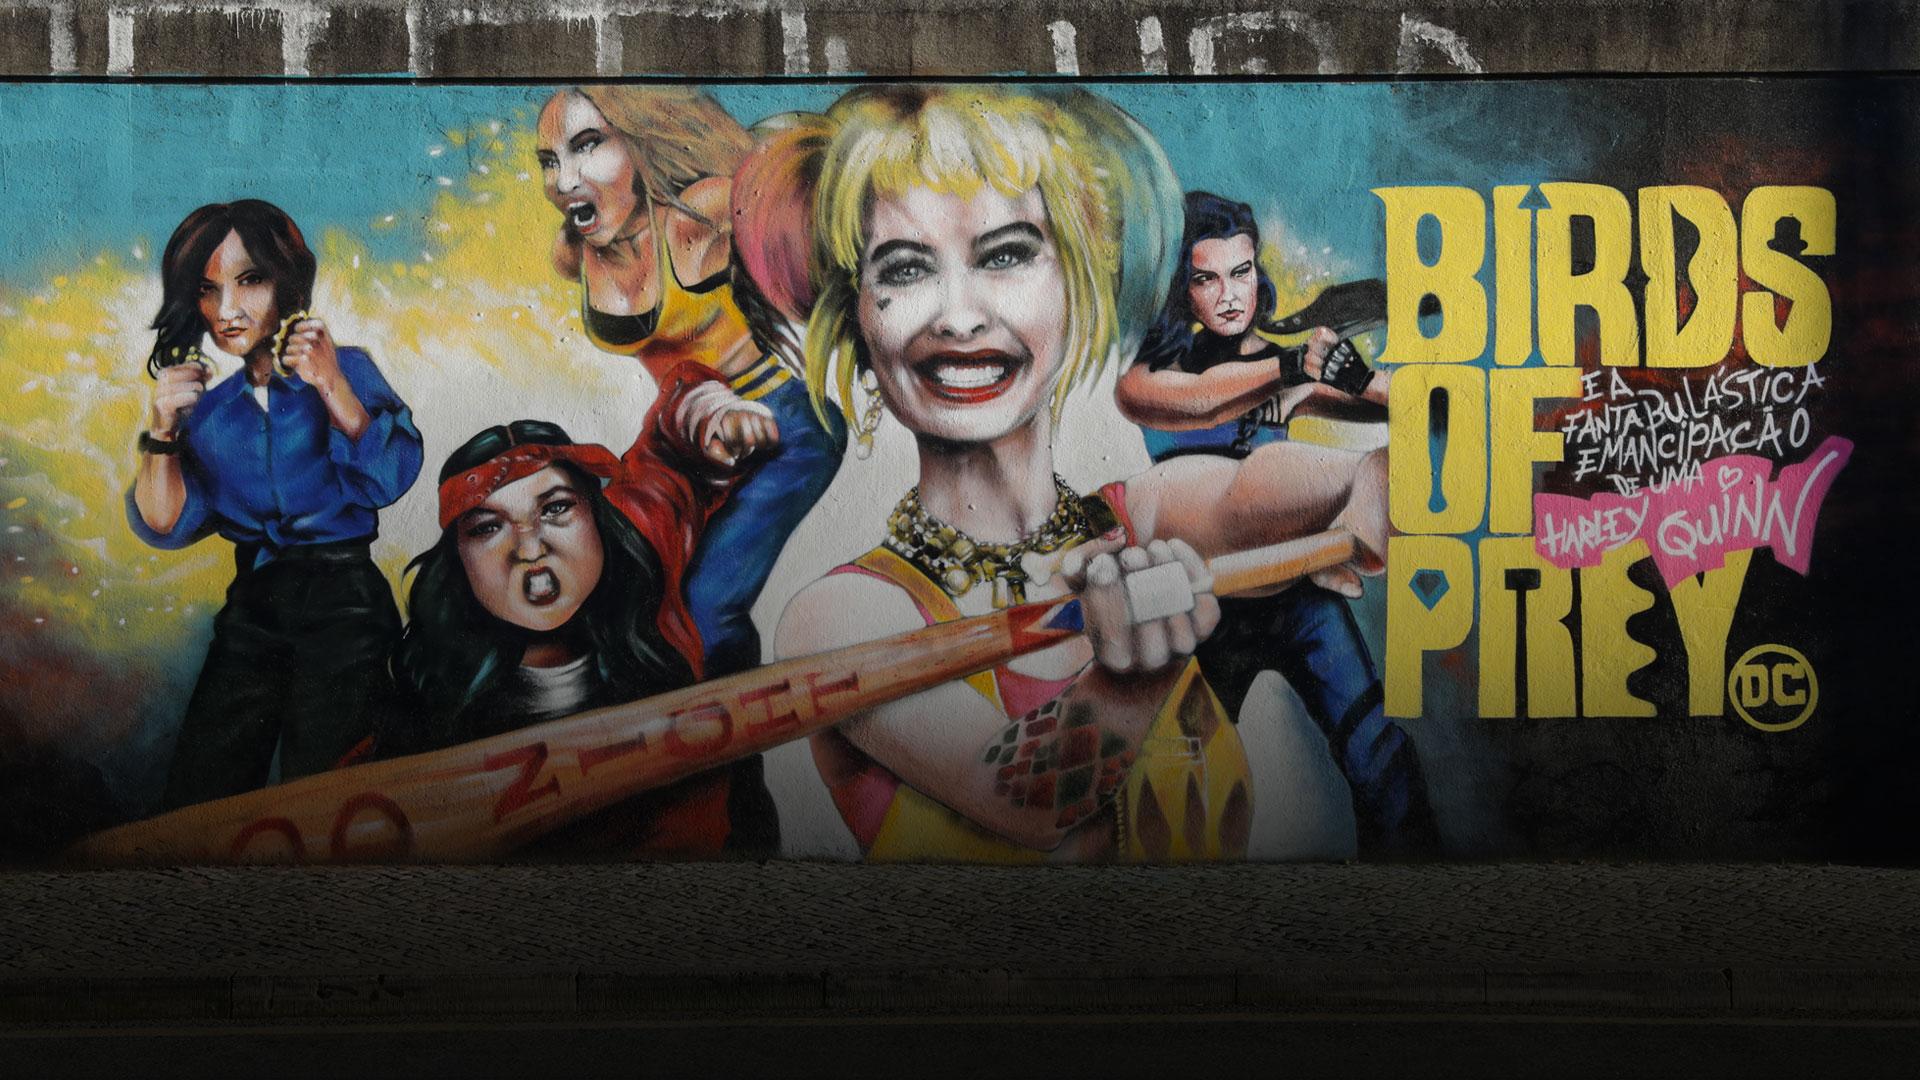 A Harley Quinn chegou às paredes de Lisboa